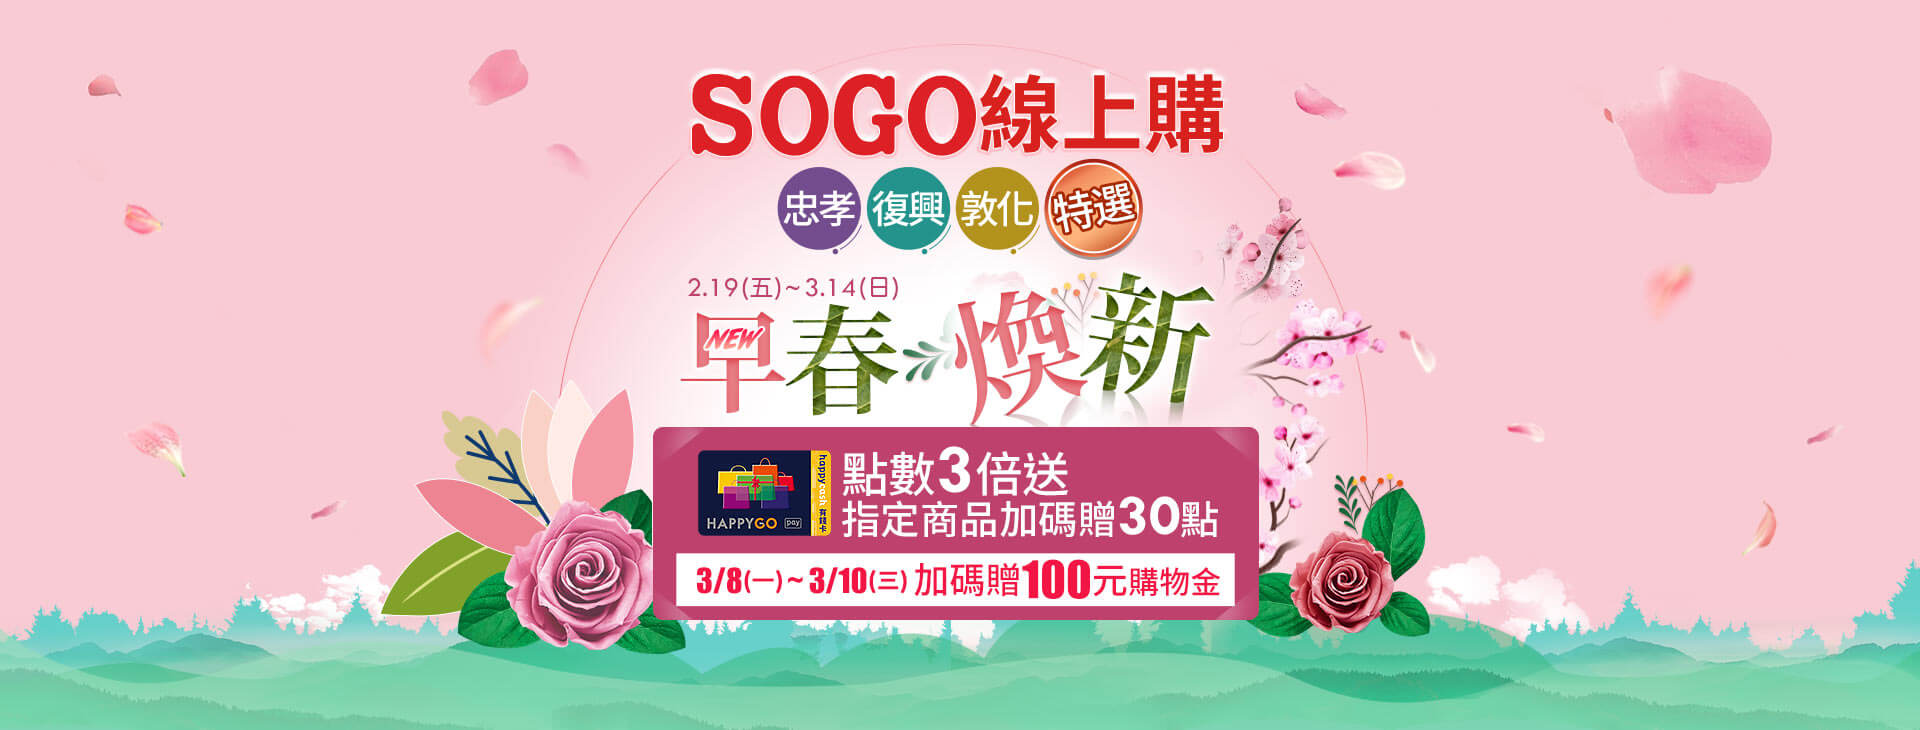 SOGO線上購「早春煥新」-2